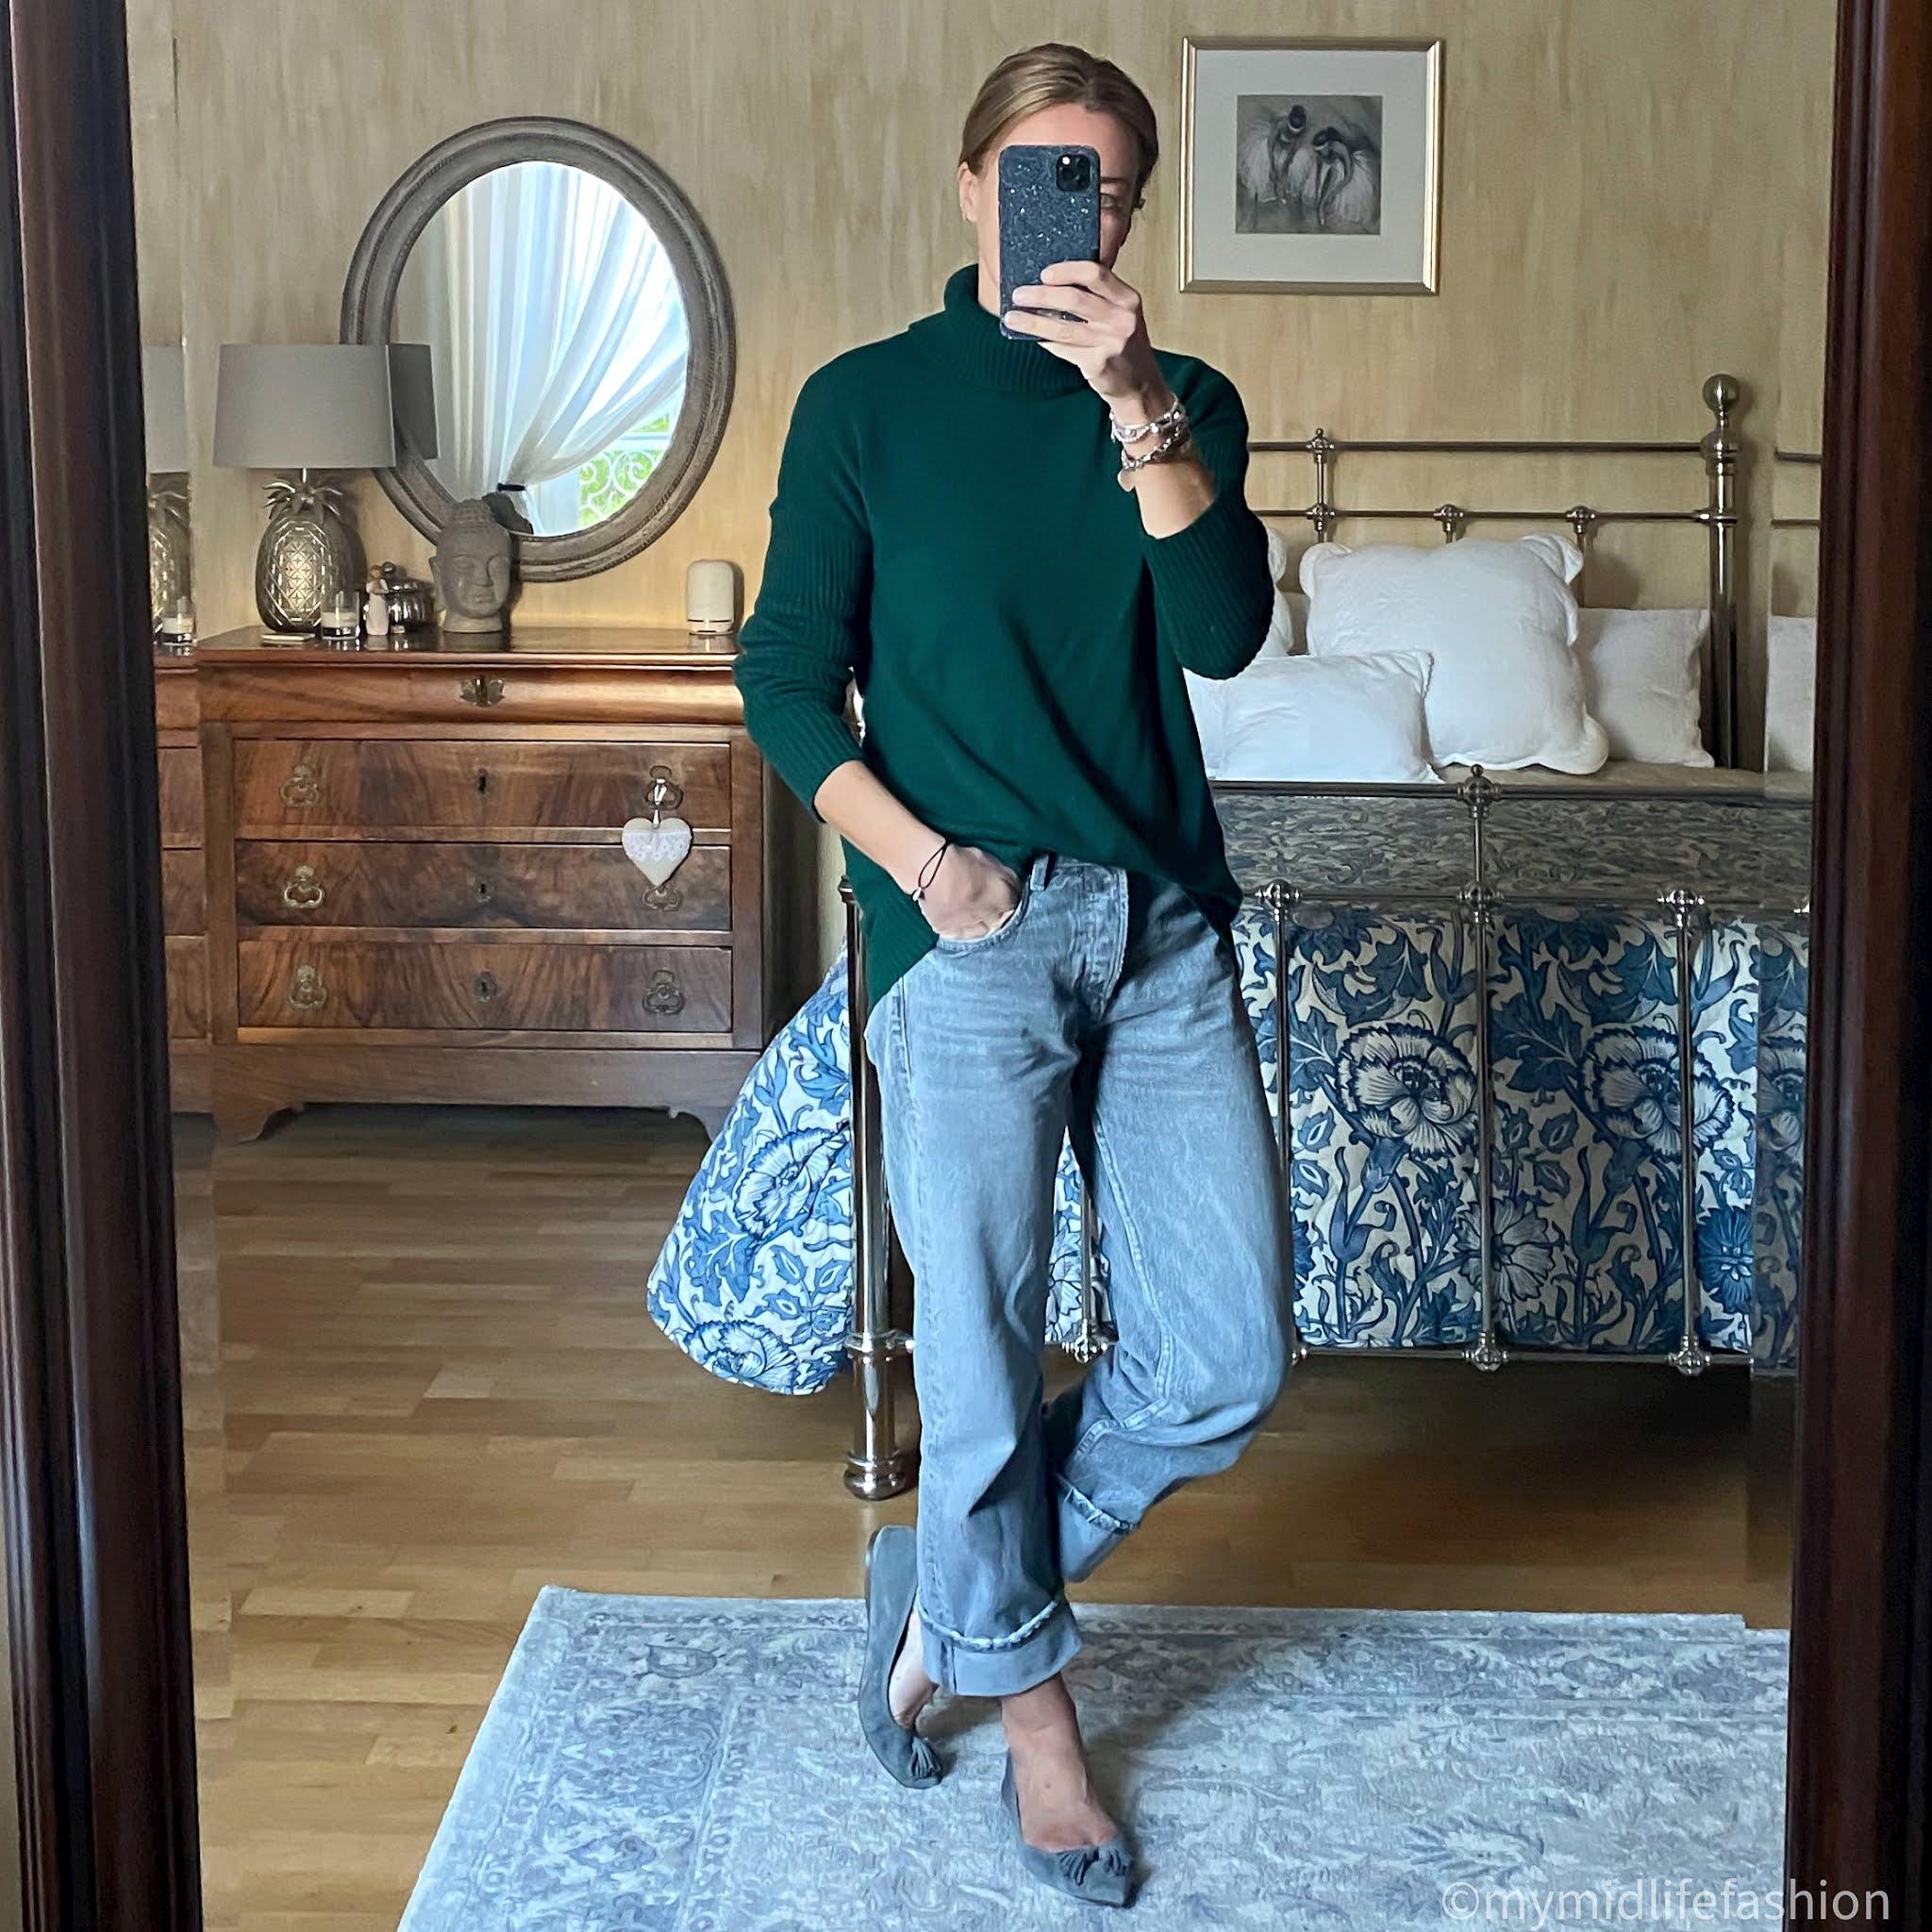 my midlife fashion, baukjen roll neck jumper, zballet pumpsara boyfriend jeans, j crew suede pointed flat